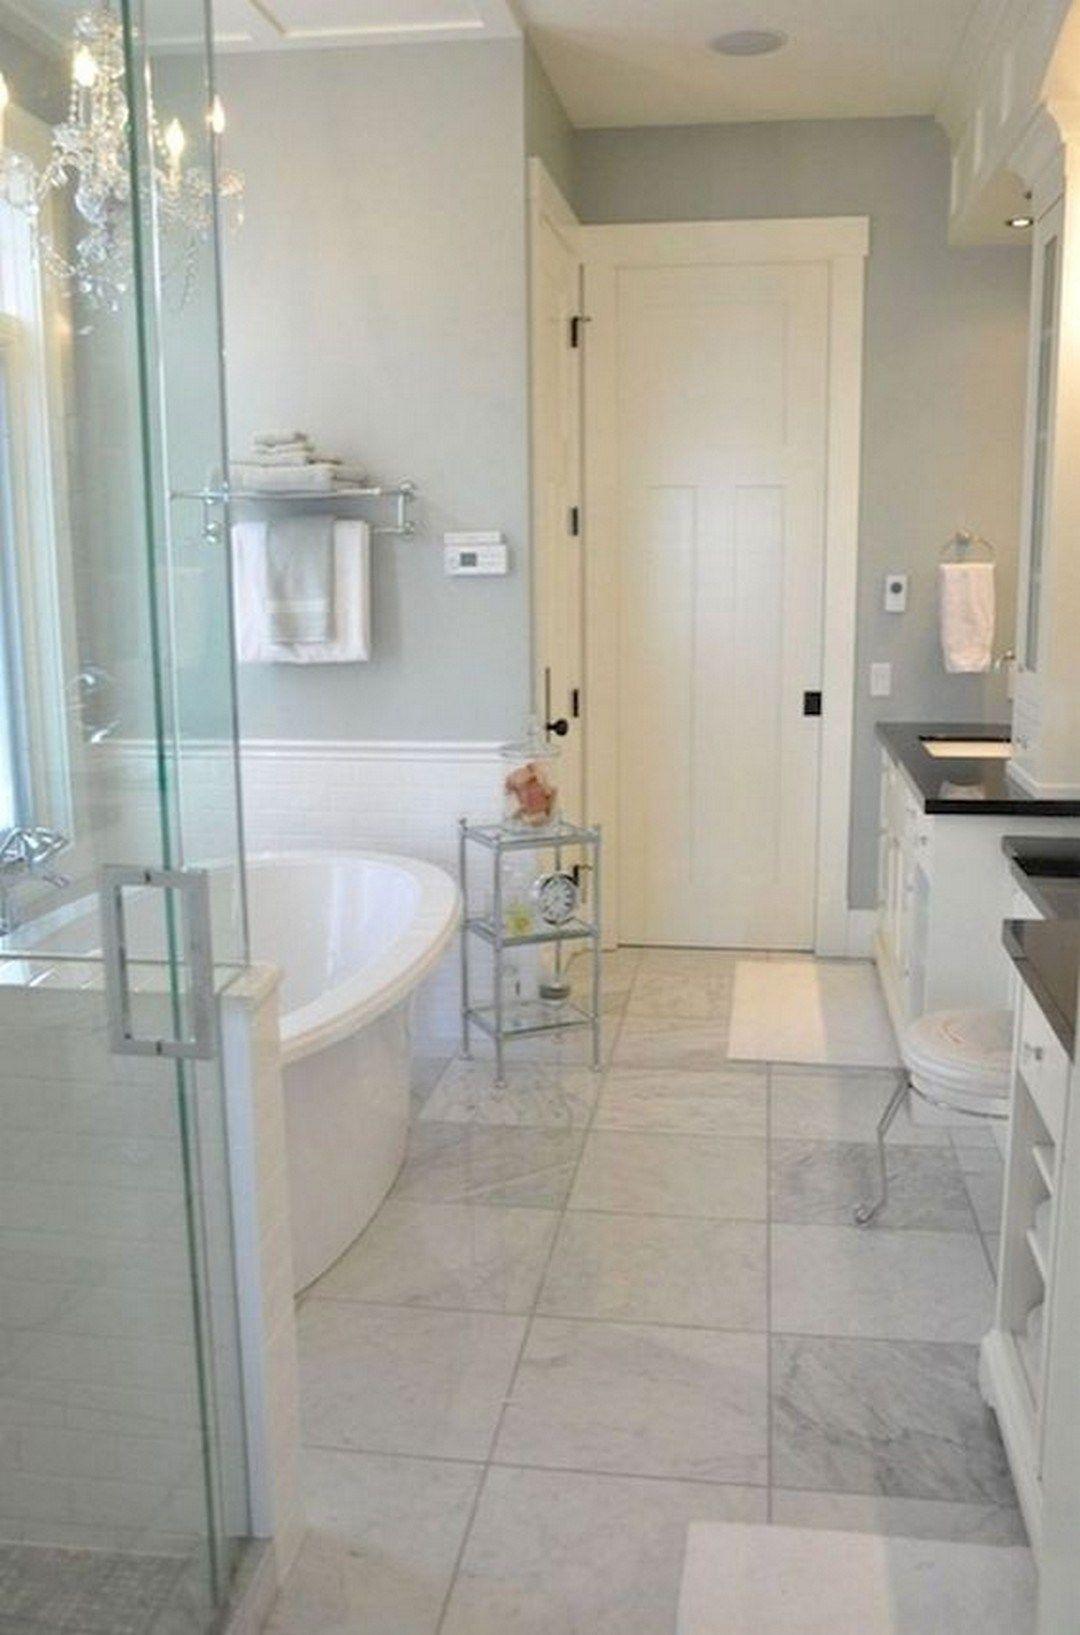 25 Small Master Bathroom Remodel On A Budget Bathroom Remodel